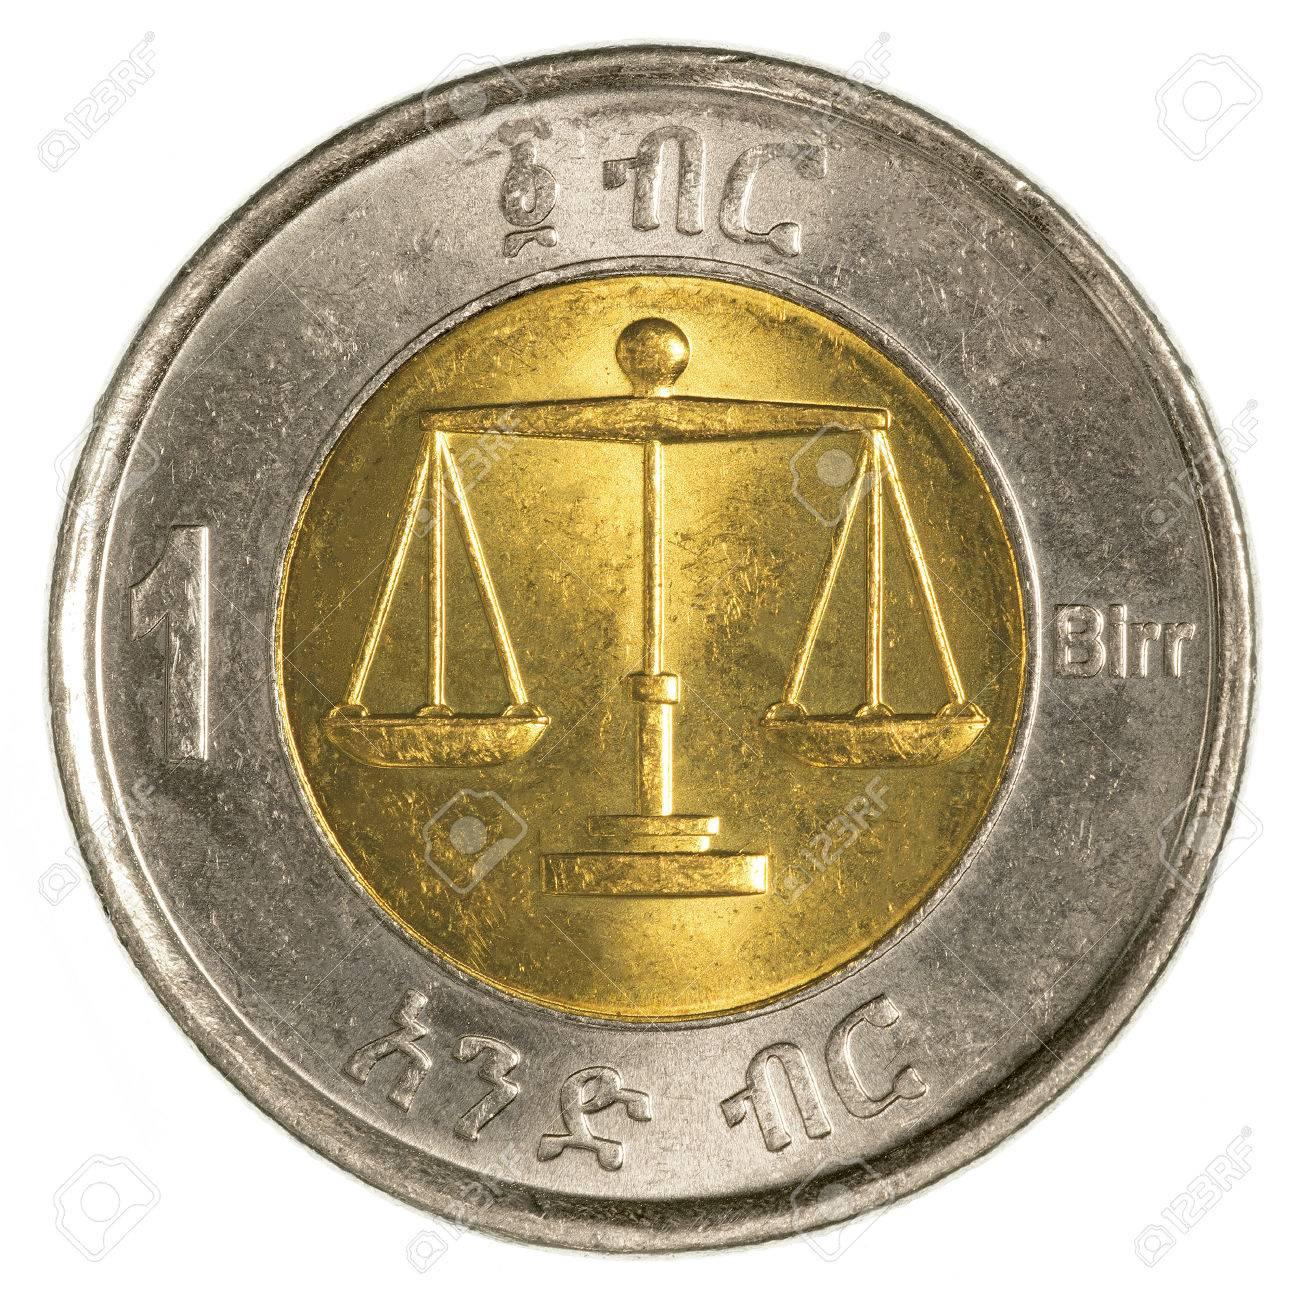 1 Ethiopian Birr Coin Isolated On White Background Stock Photo